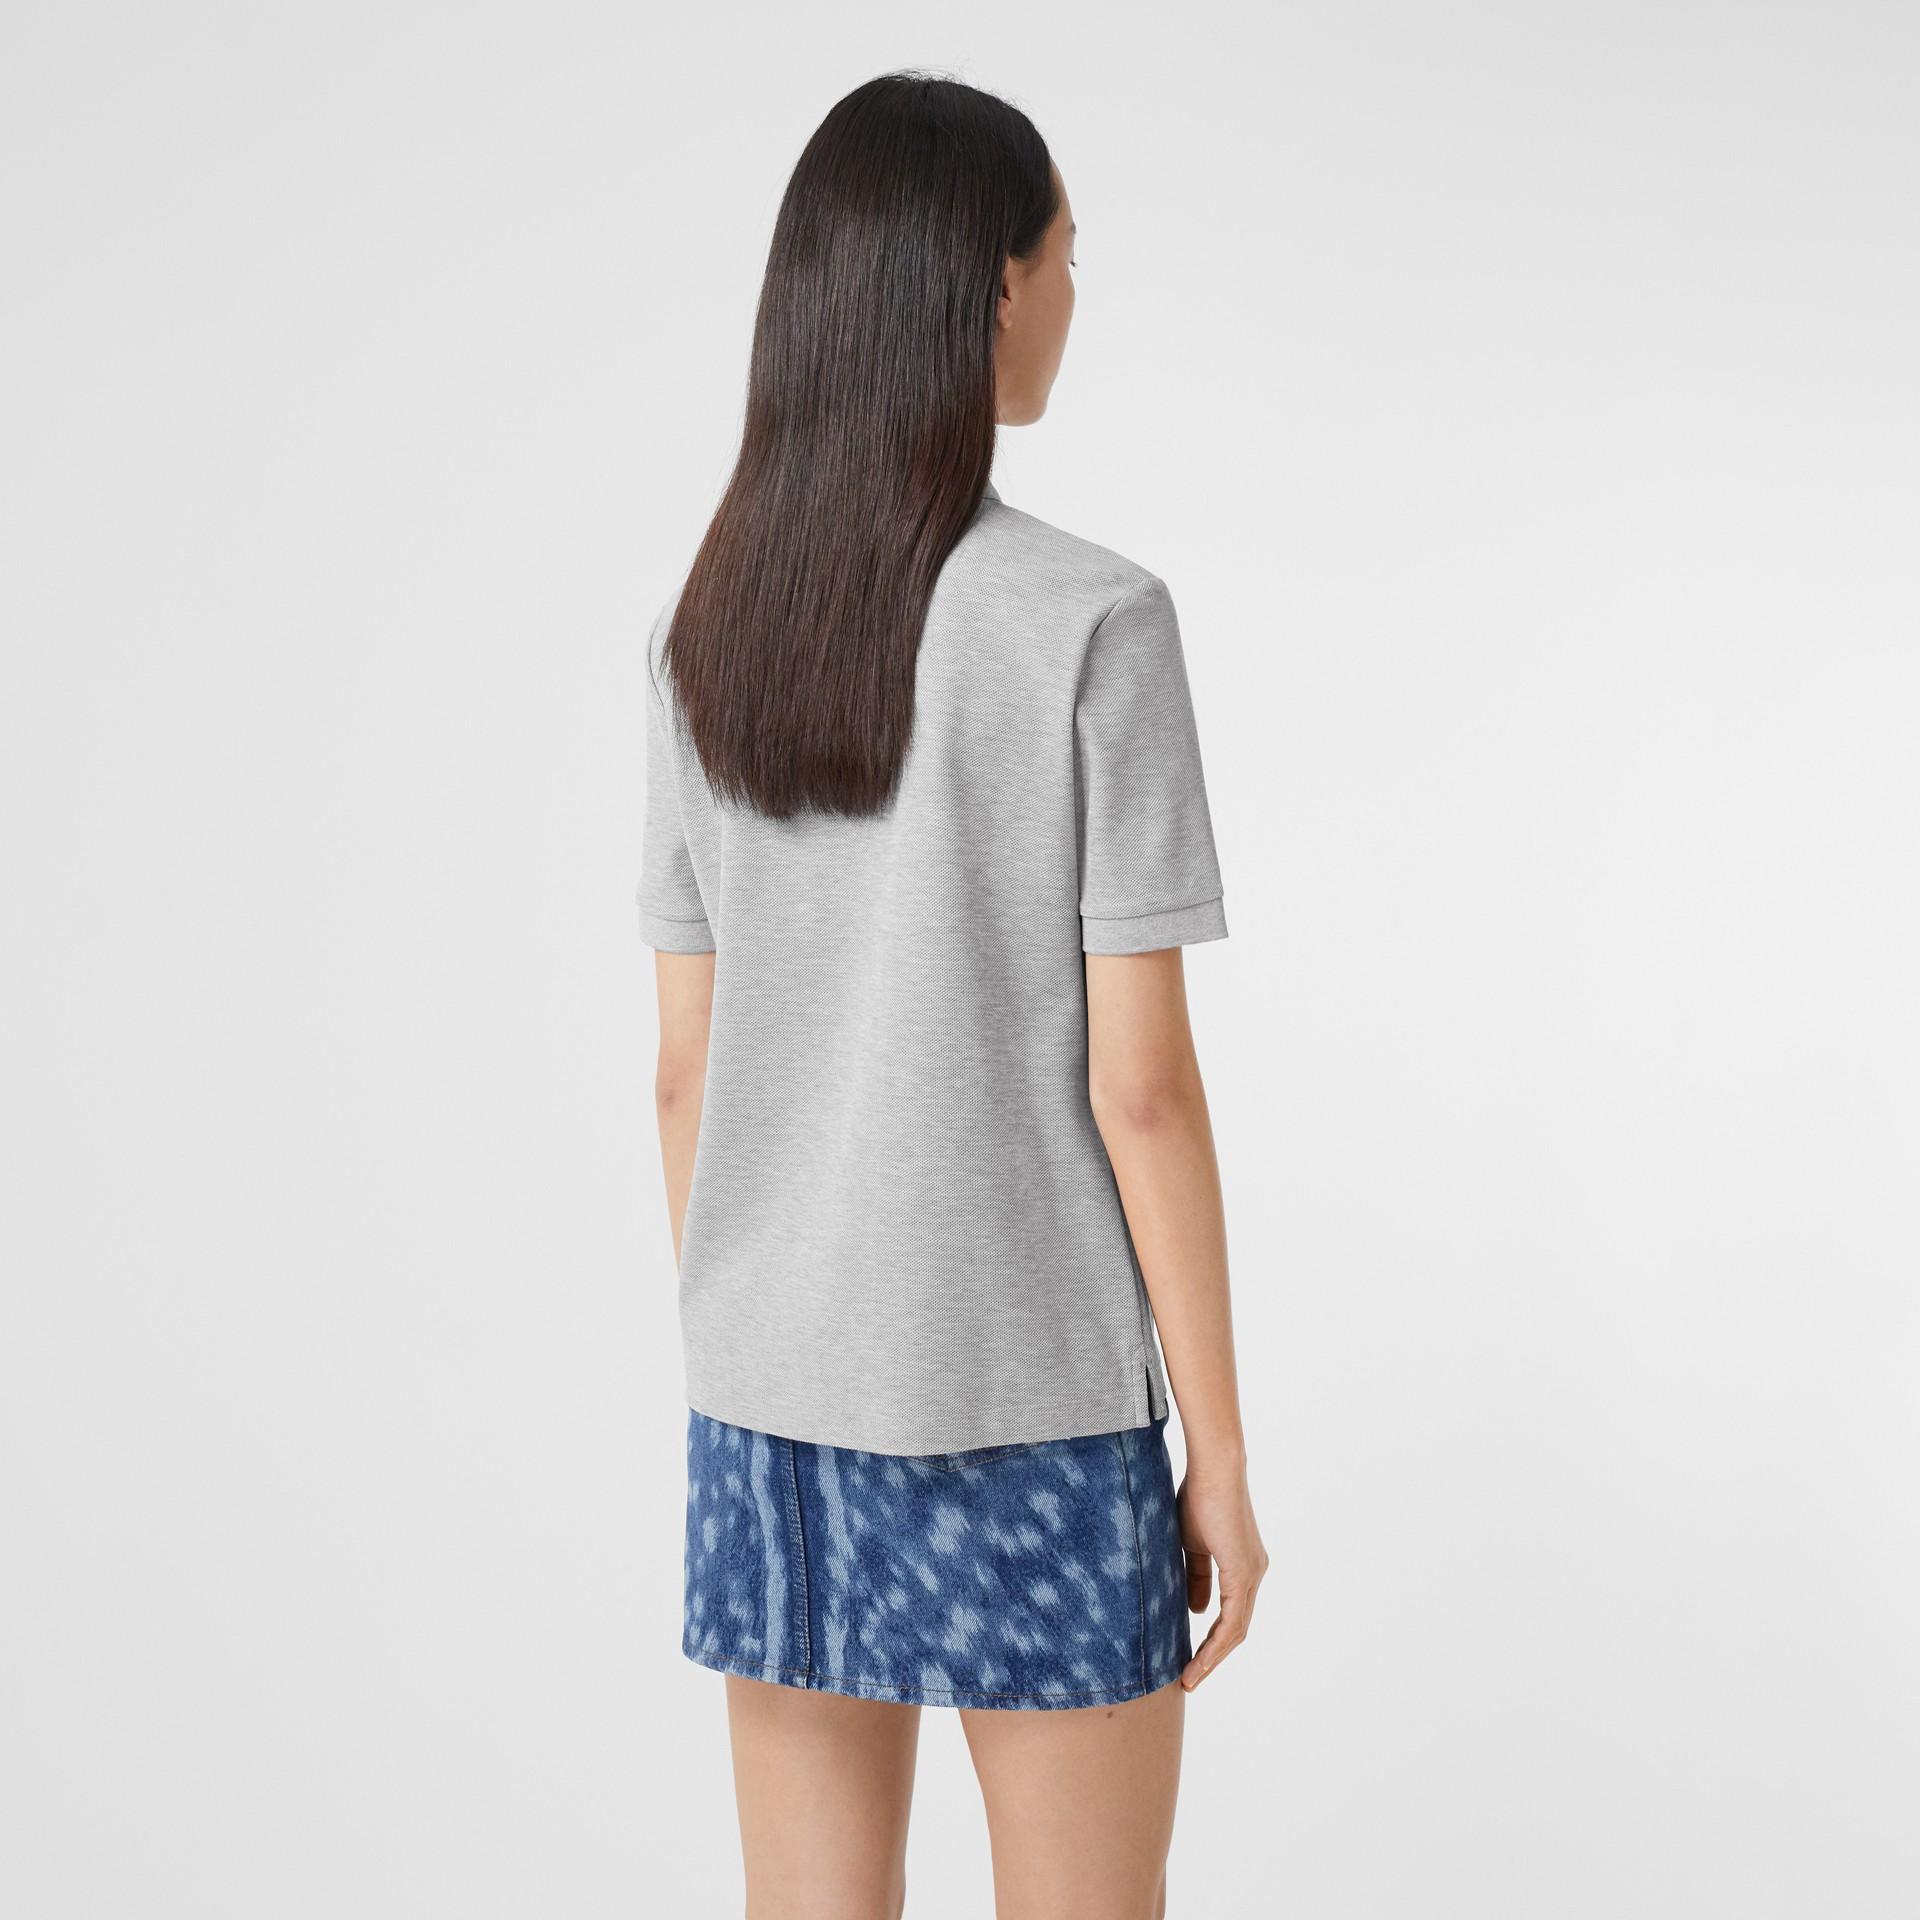 Monogram Motif Cotton Piqué Polo Shirt in Pale Grey Melange - Women | Burberry United Kingdom - gallery image 2